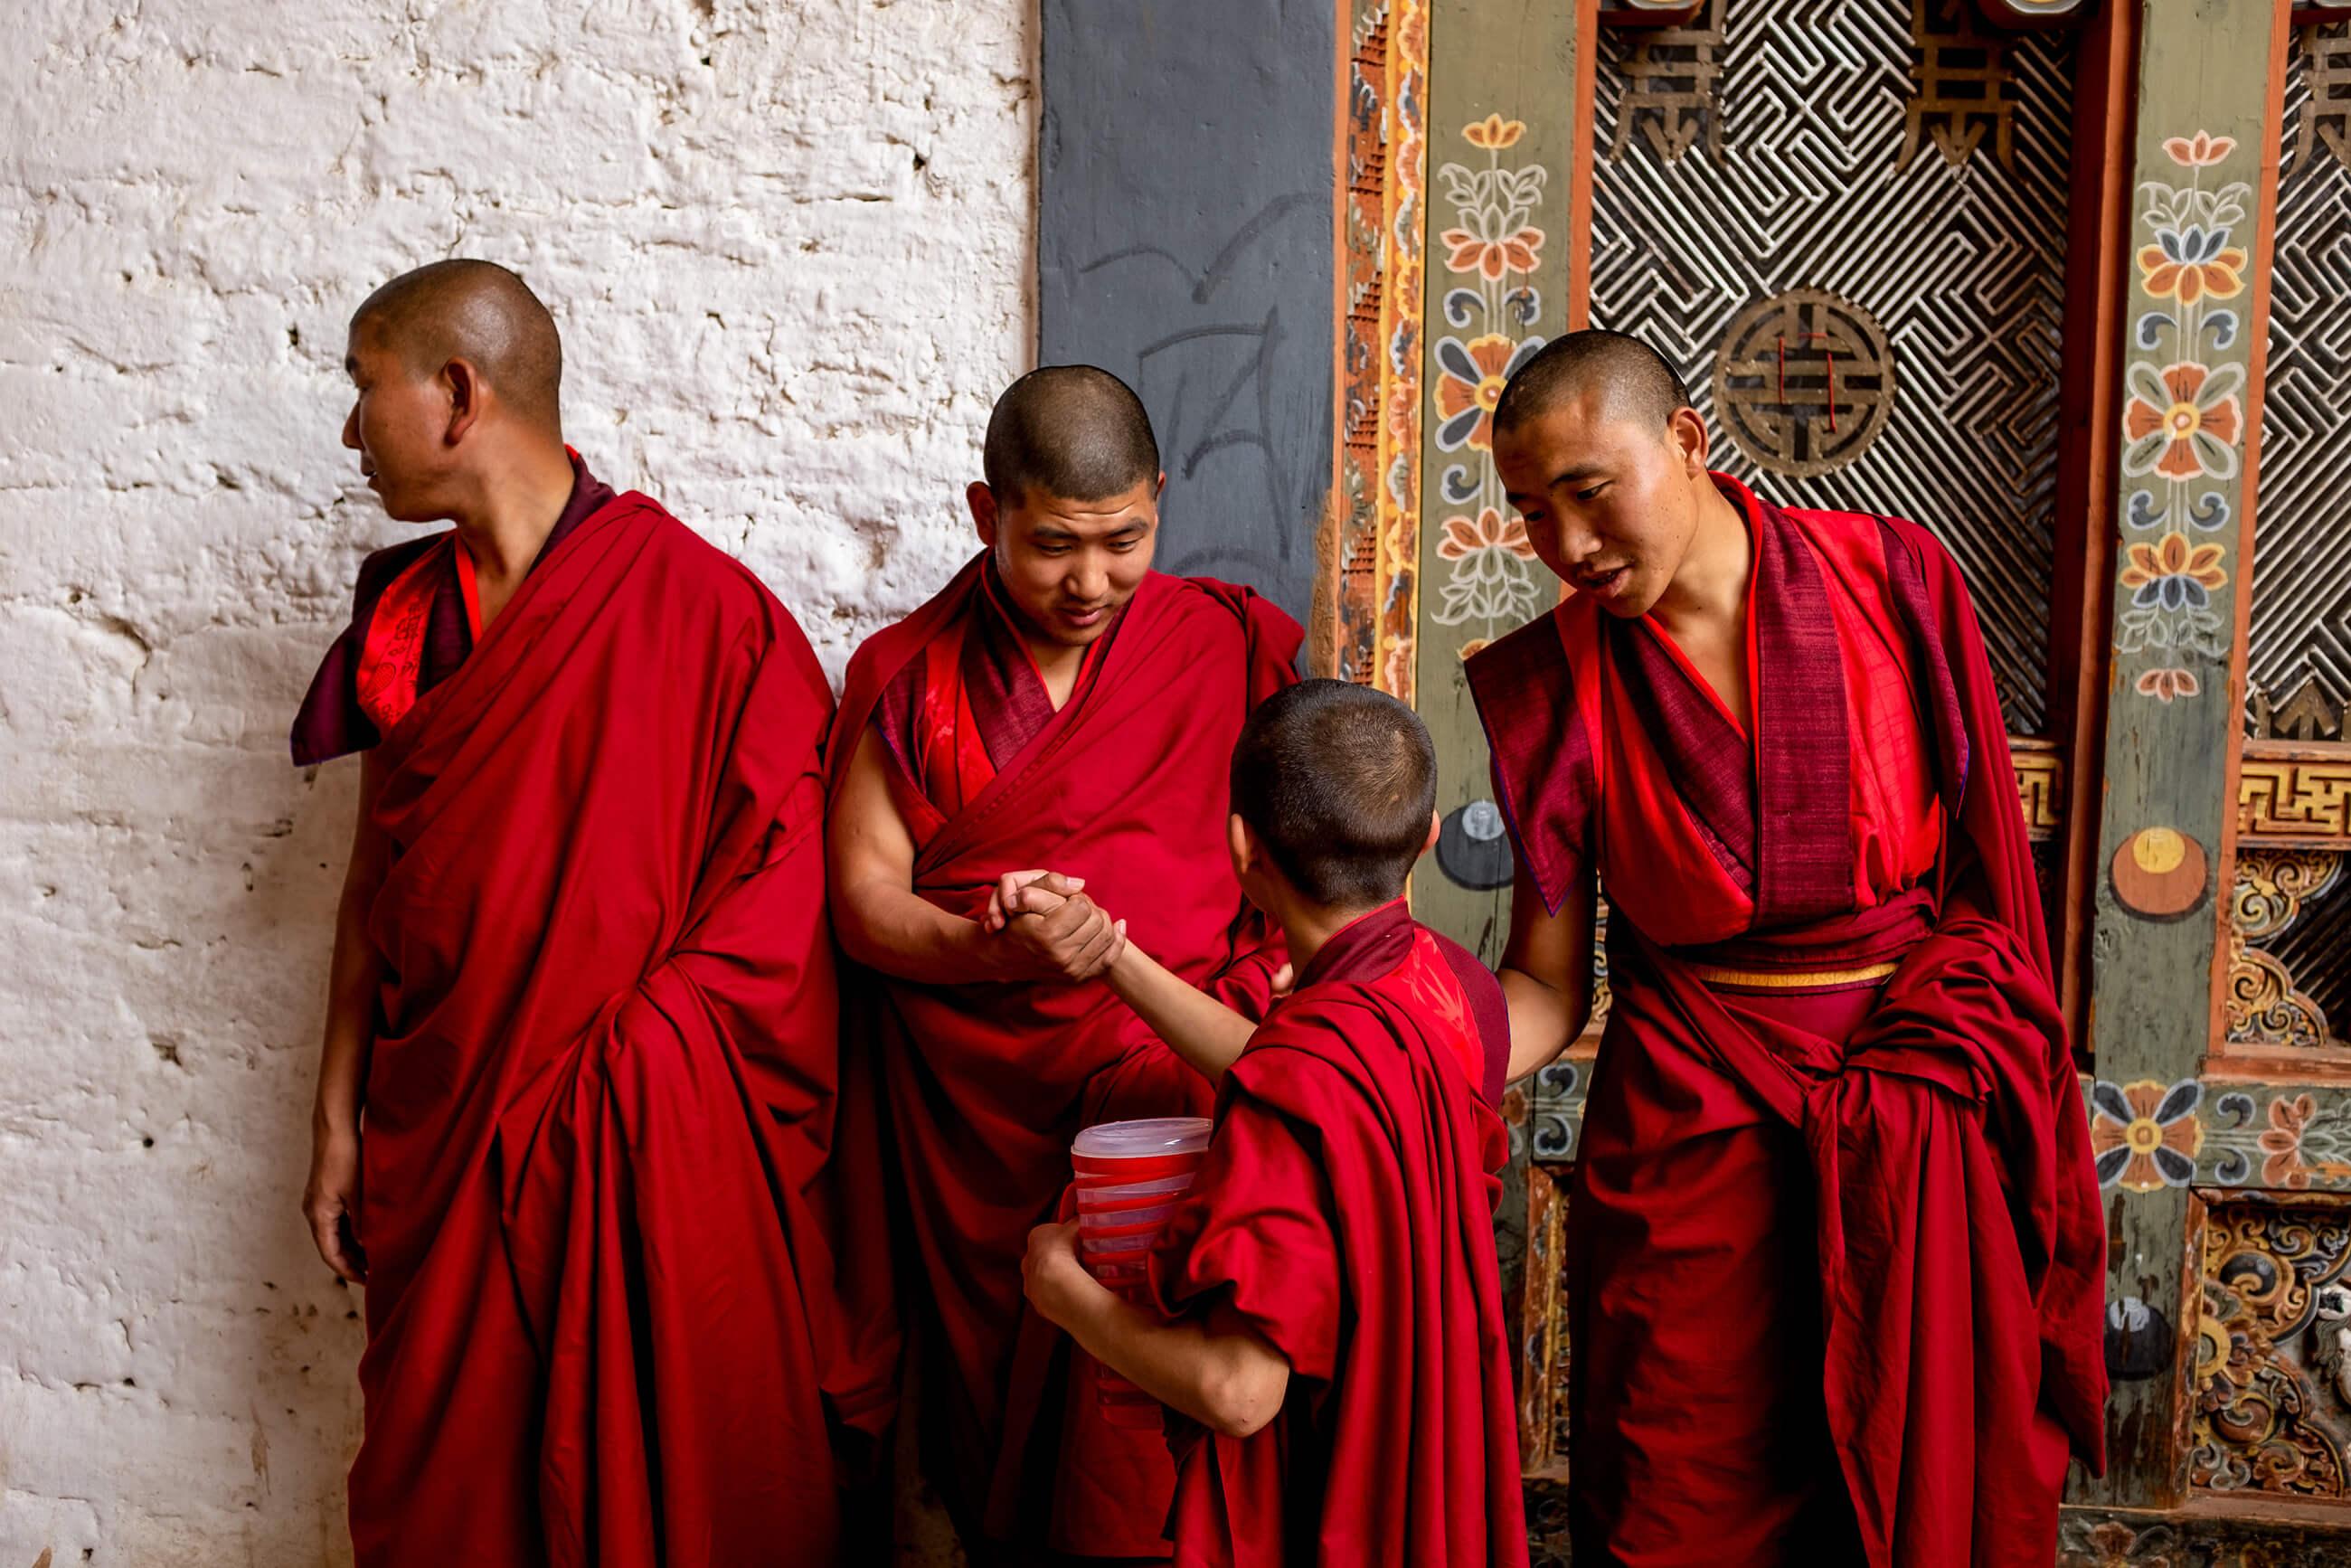 https://bubo.sk/uploads/galleries/4914/robert_taraba_bhutan_mnisi-12.jpg